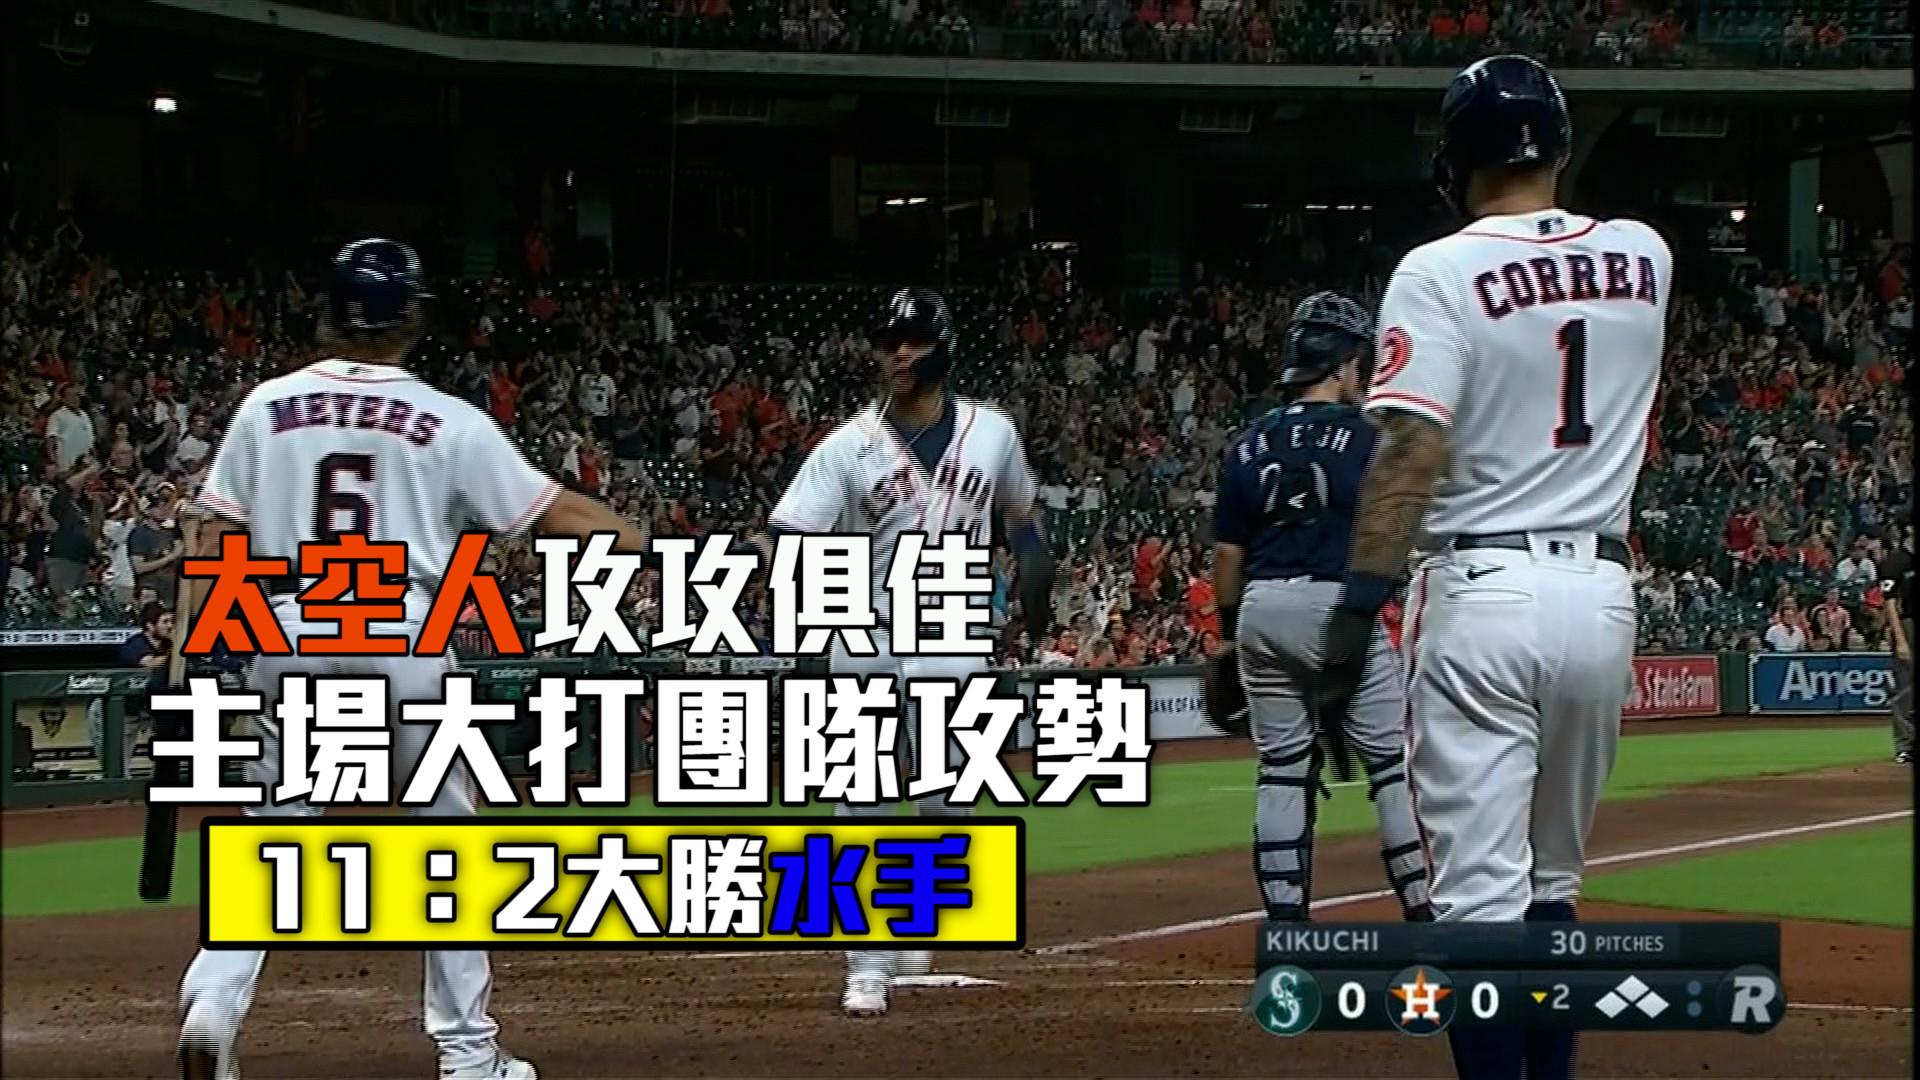 【MLB看愛爾達】太空人攻守俱佳 11:2主場痛宰水手 09/07